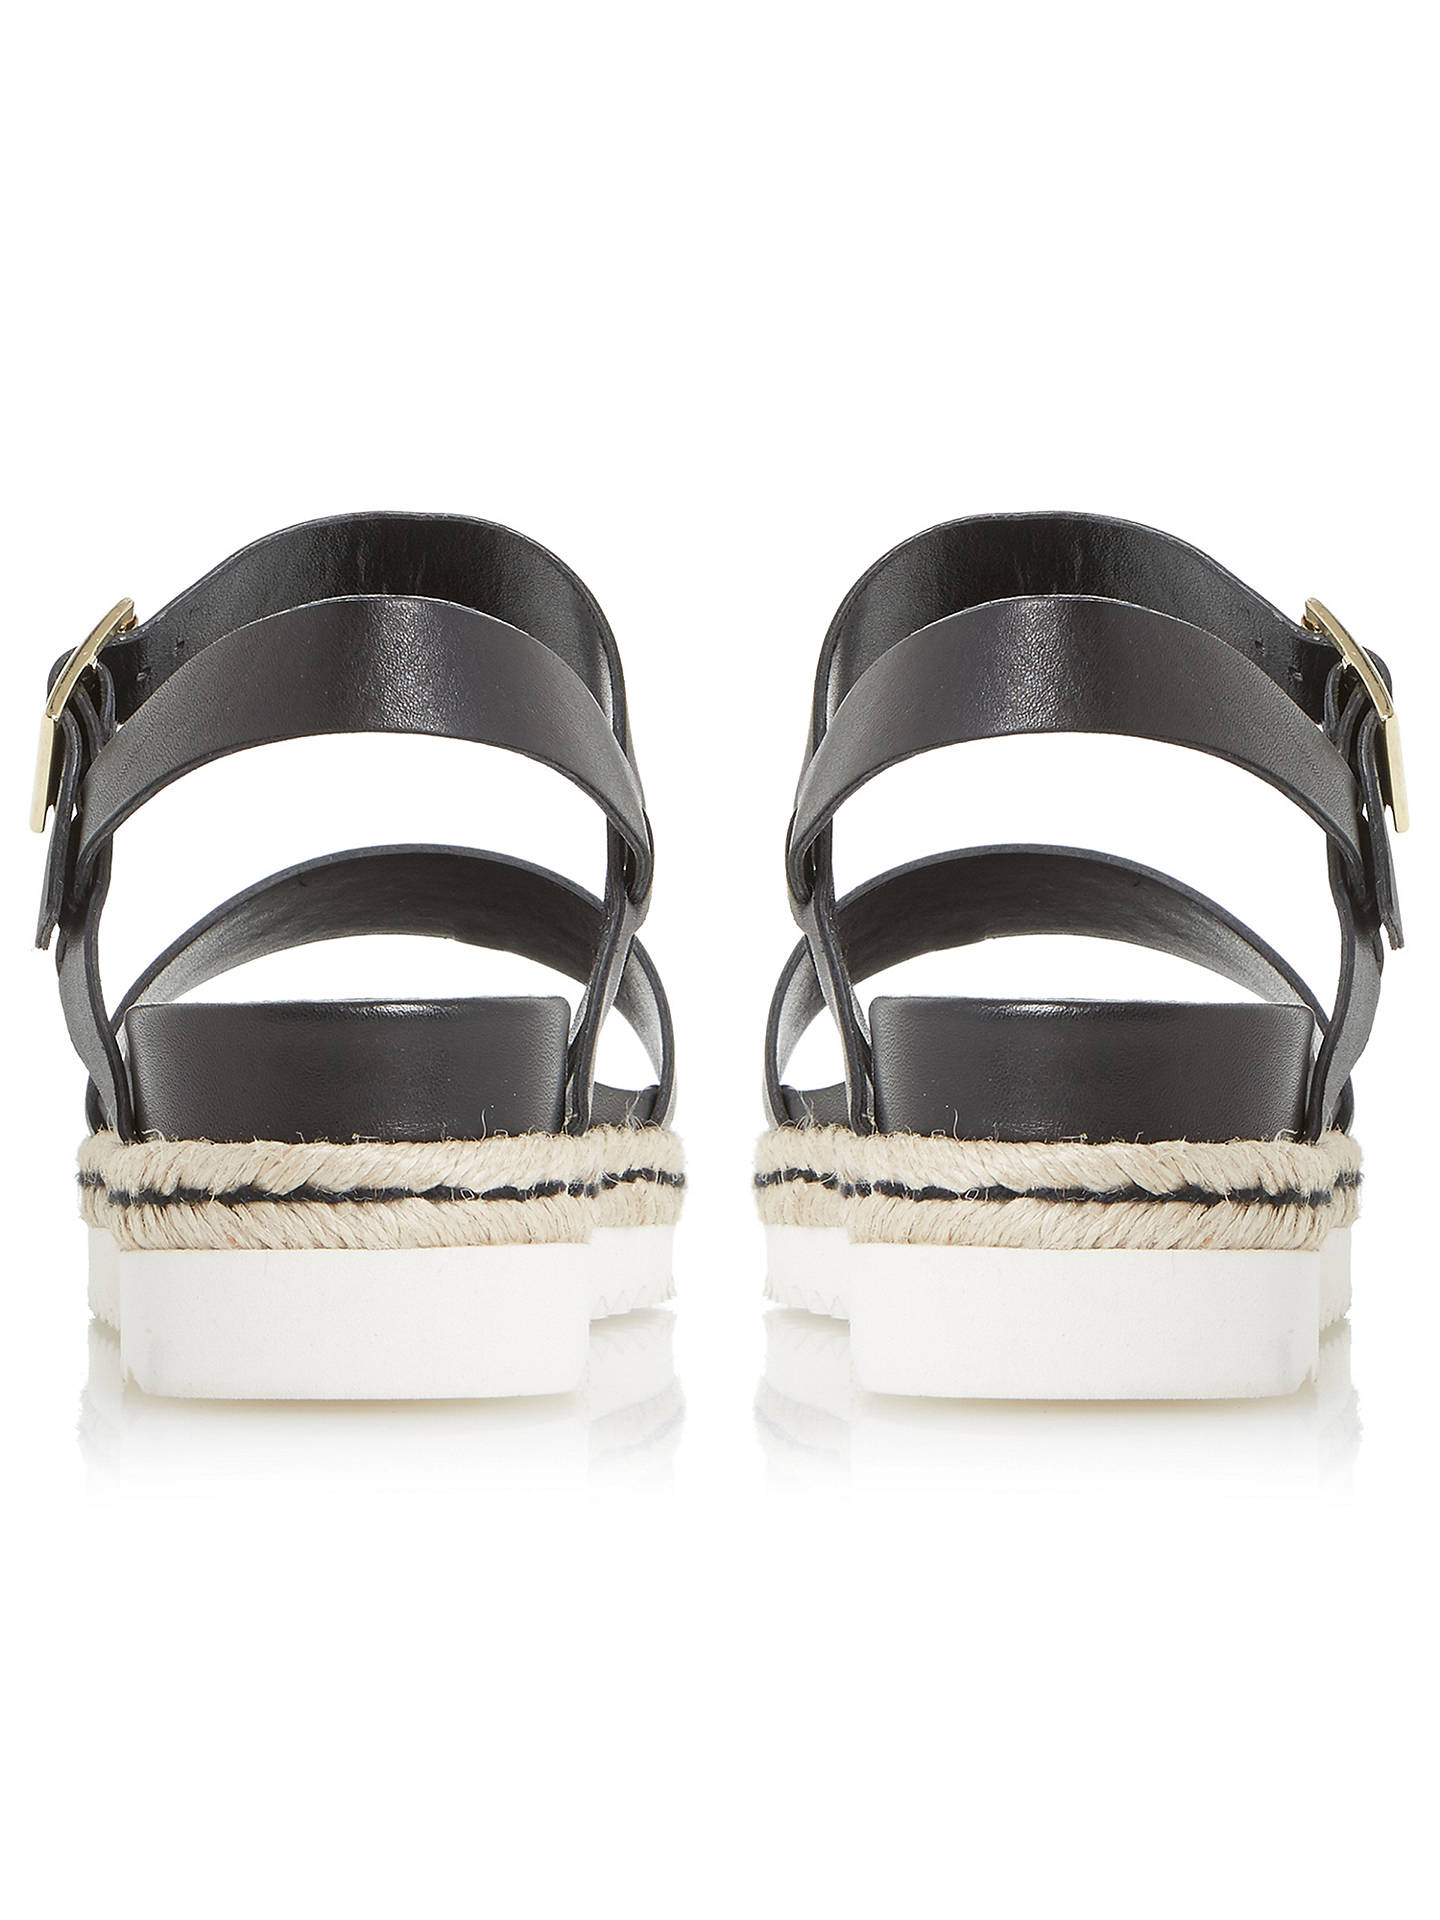 081cde997984 Dune Black Liss Flatform Sandals at John Lewis   Partners